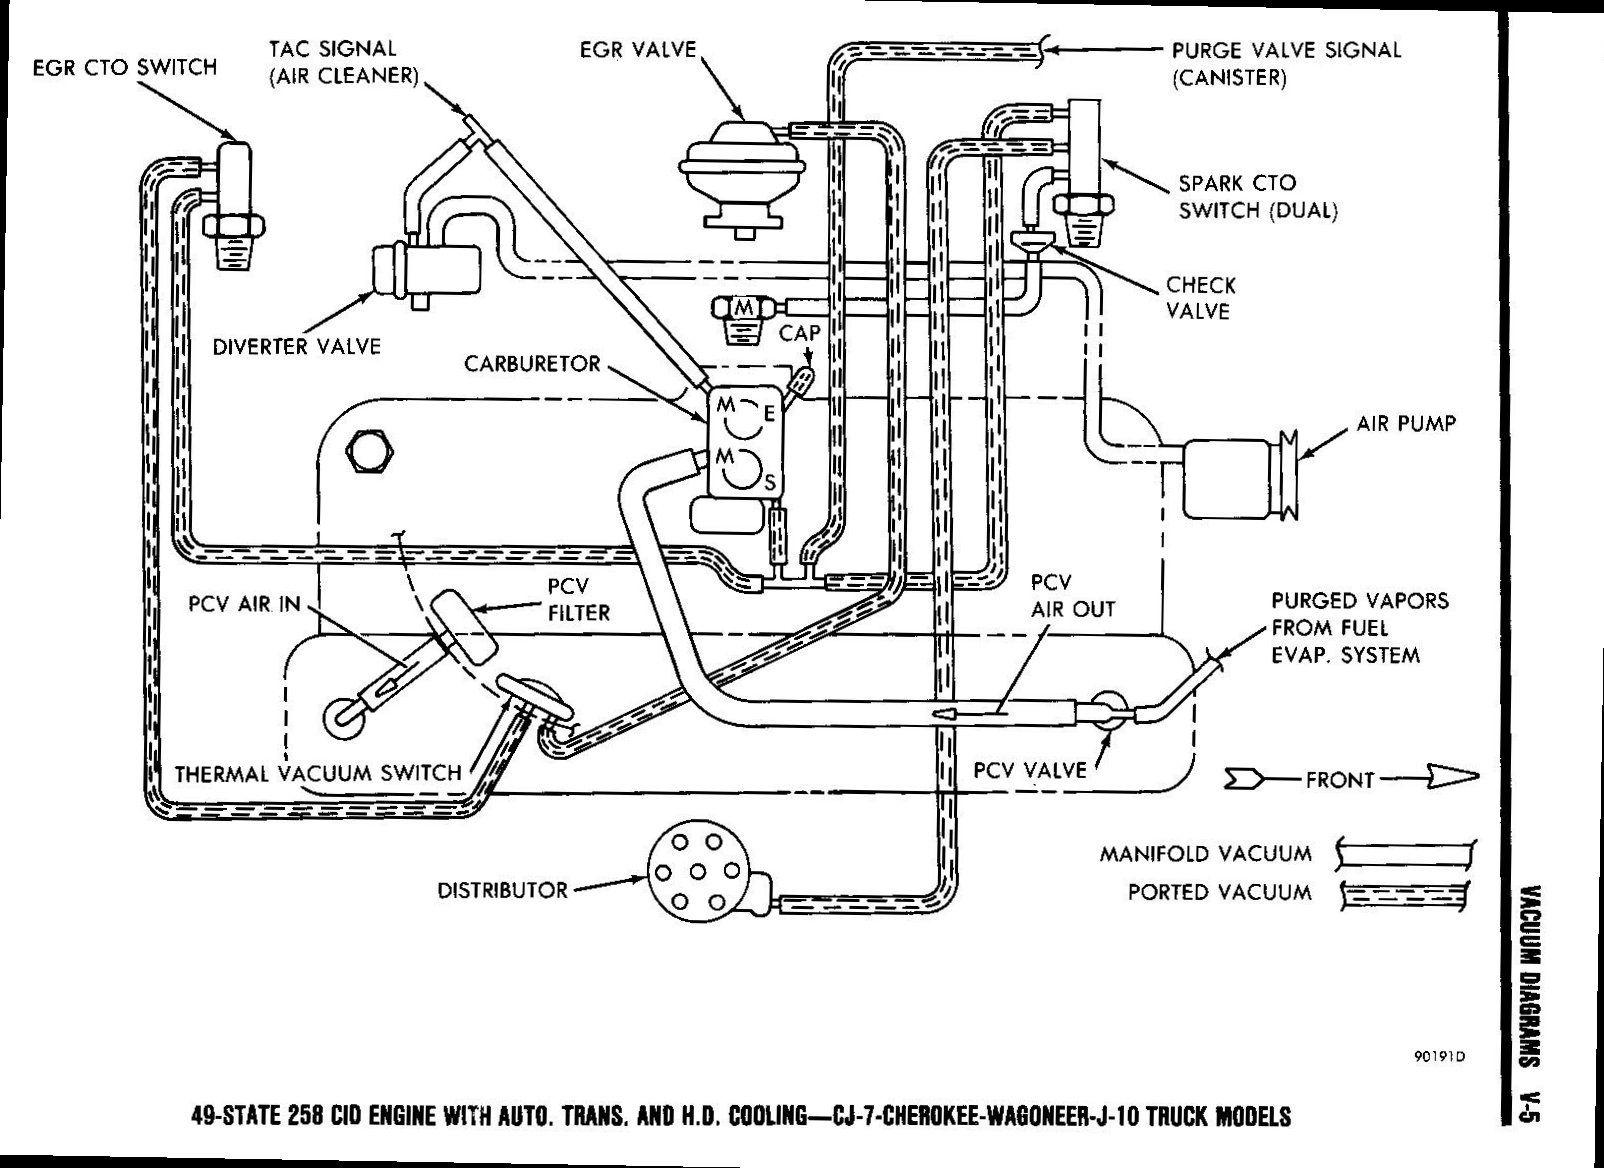 Cool 1979 Jeep Cj7 V8 Wiring Diagram Wiring Diagram Wiring Cloud Hemtshollocom